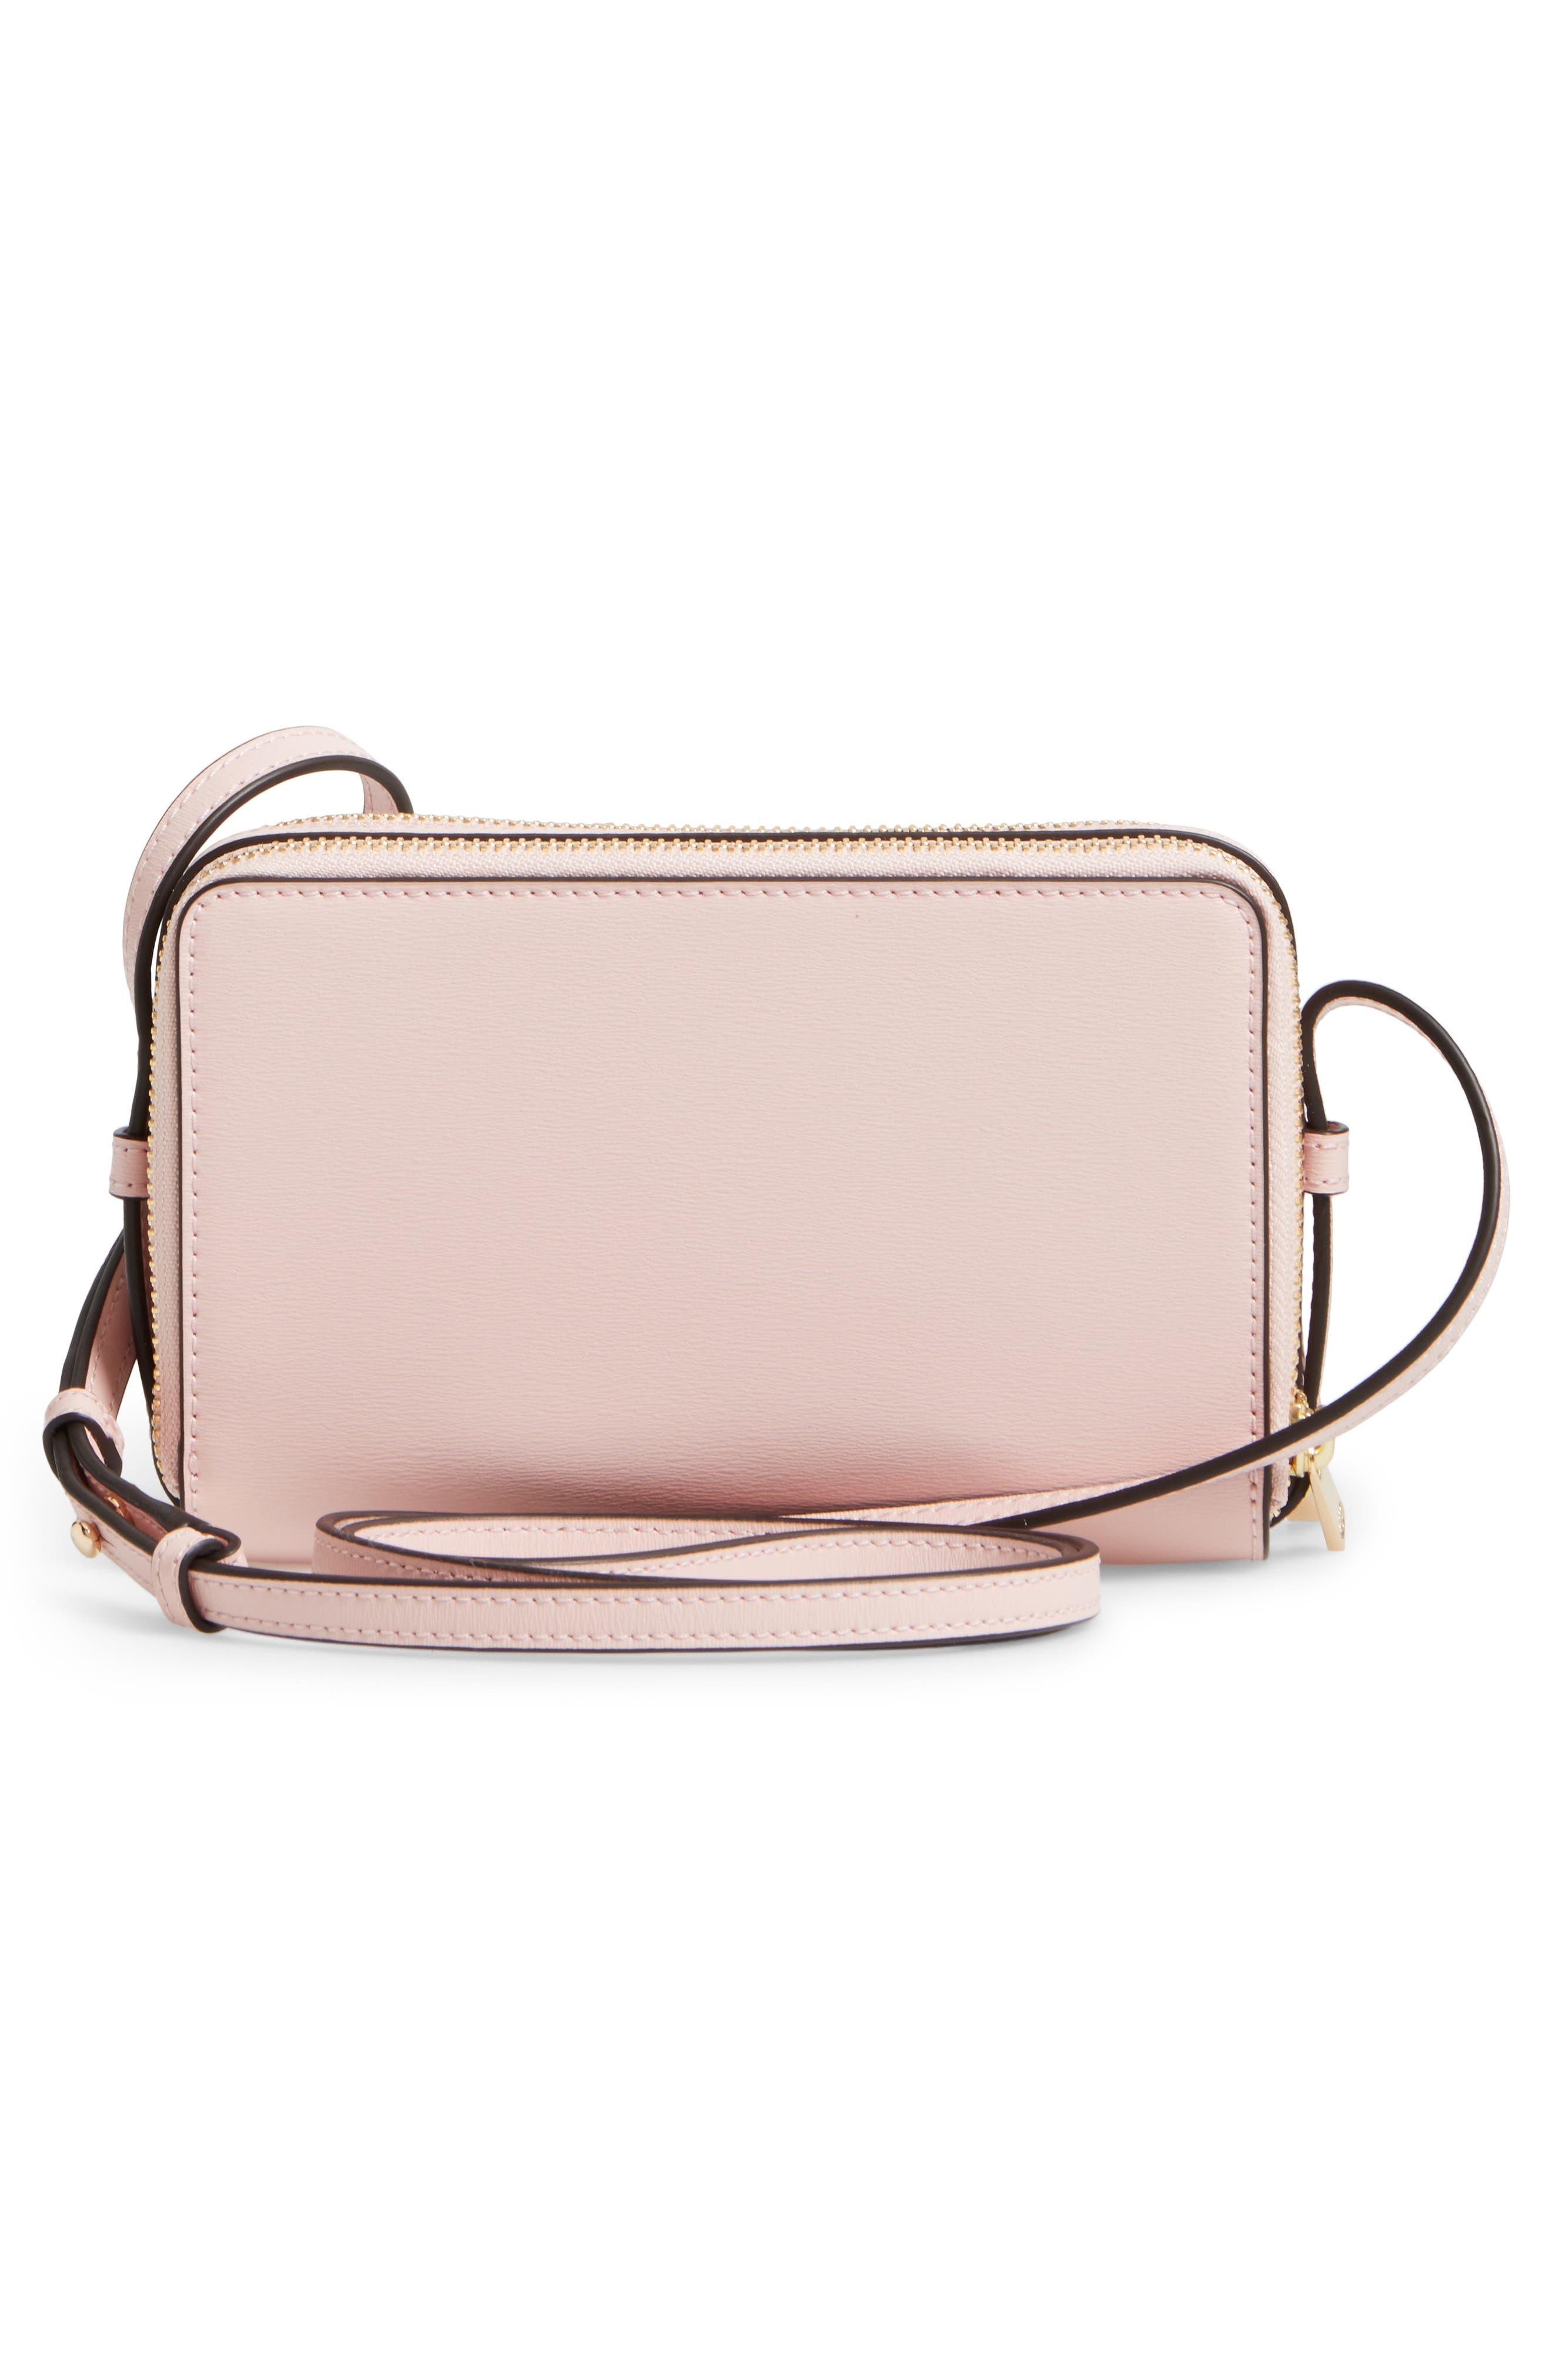 TORY BURCH Mini Parker Leather Crossbody Bag Neutrals | ModeSens